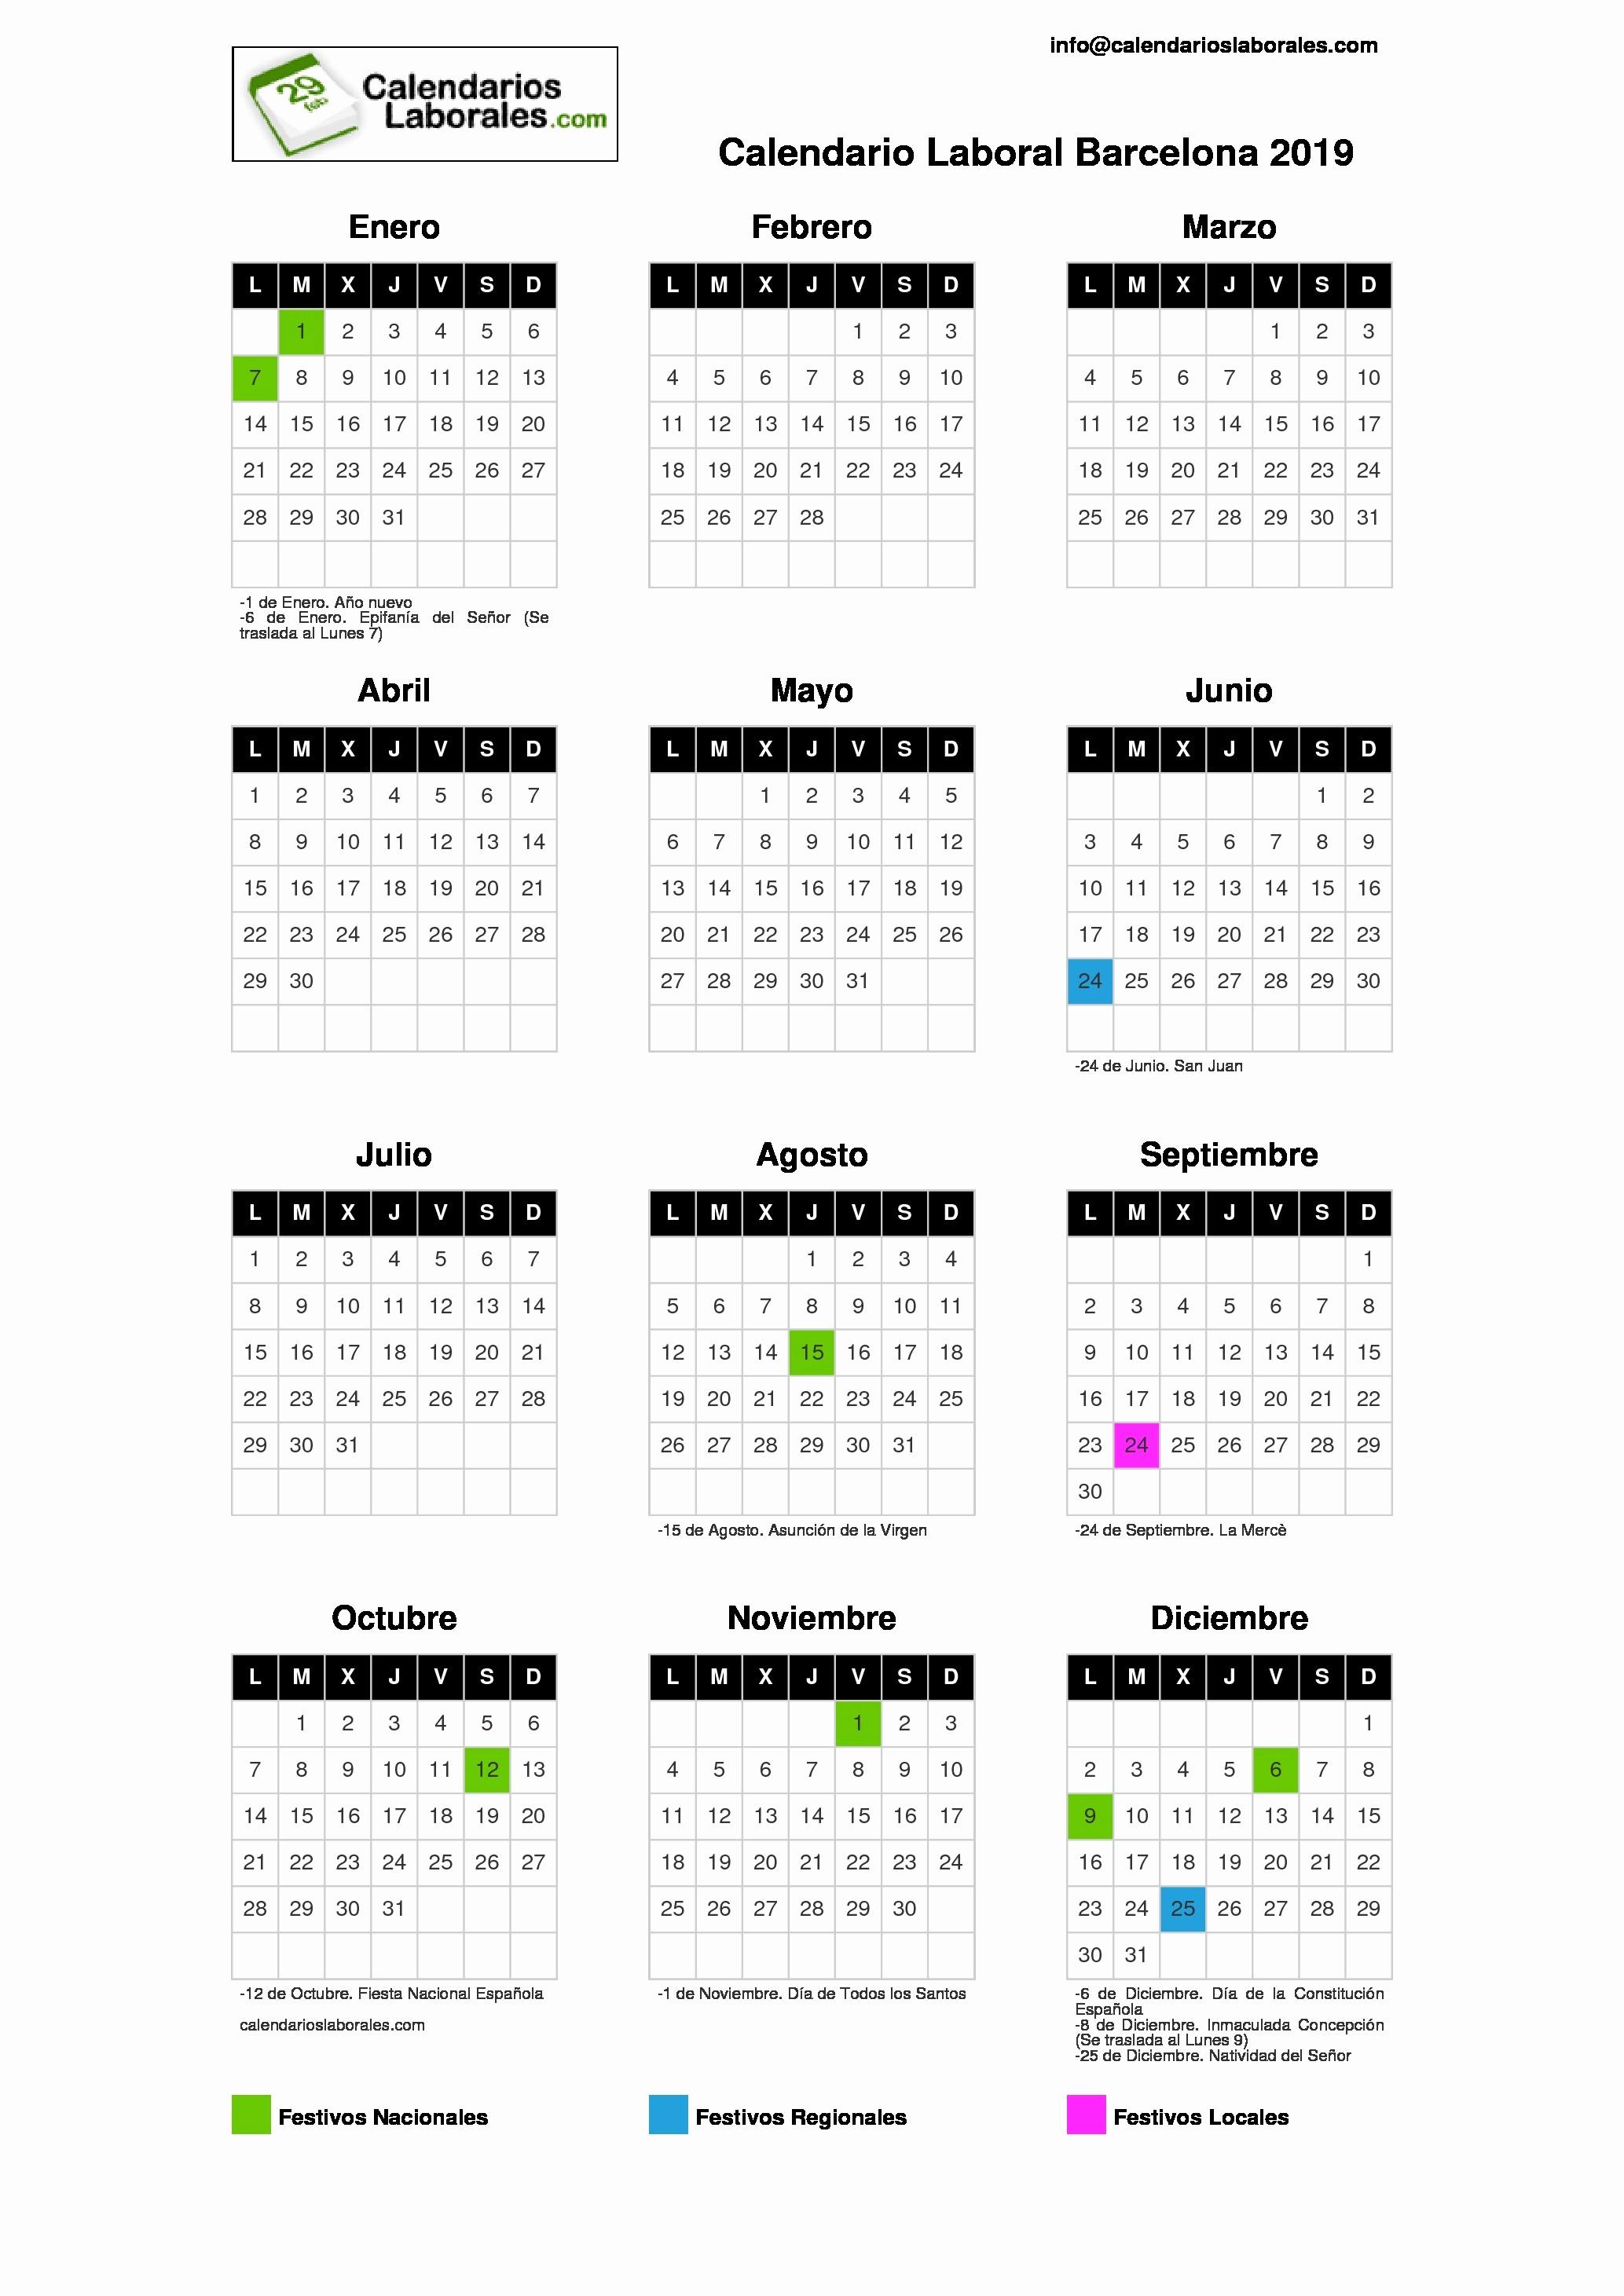 Calendario Laboral 2019 Barcelona 2019 Calendario Laboral Barcelona 2019